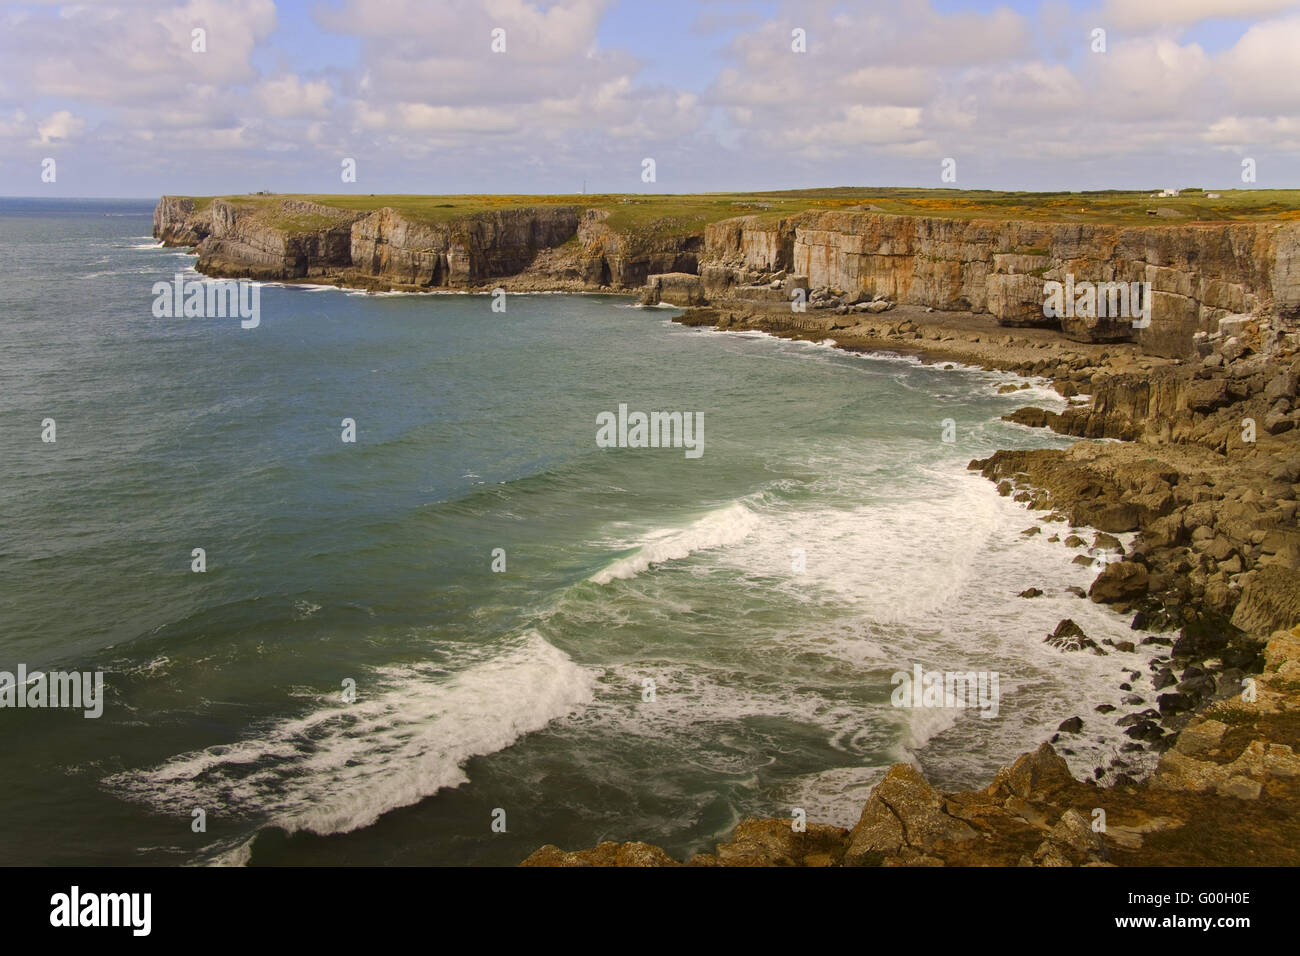 UK Pembrokeshire  Beach Scene Near Elegug Pillars - Stock Image